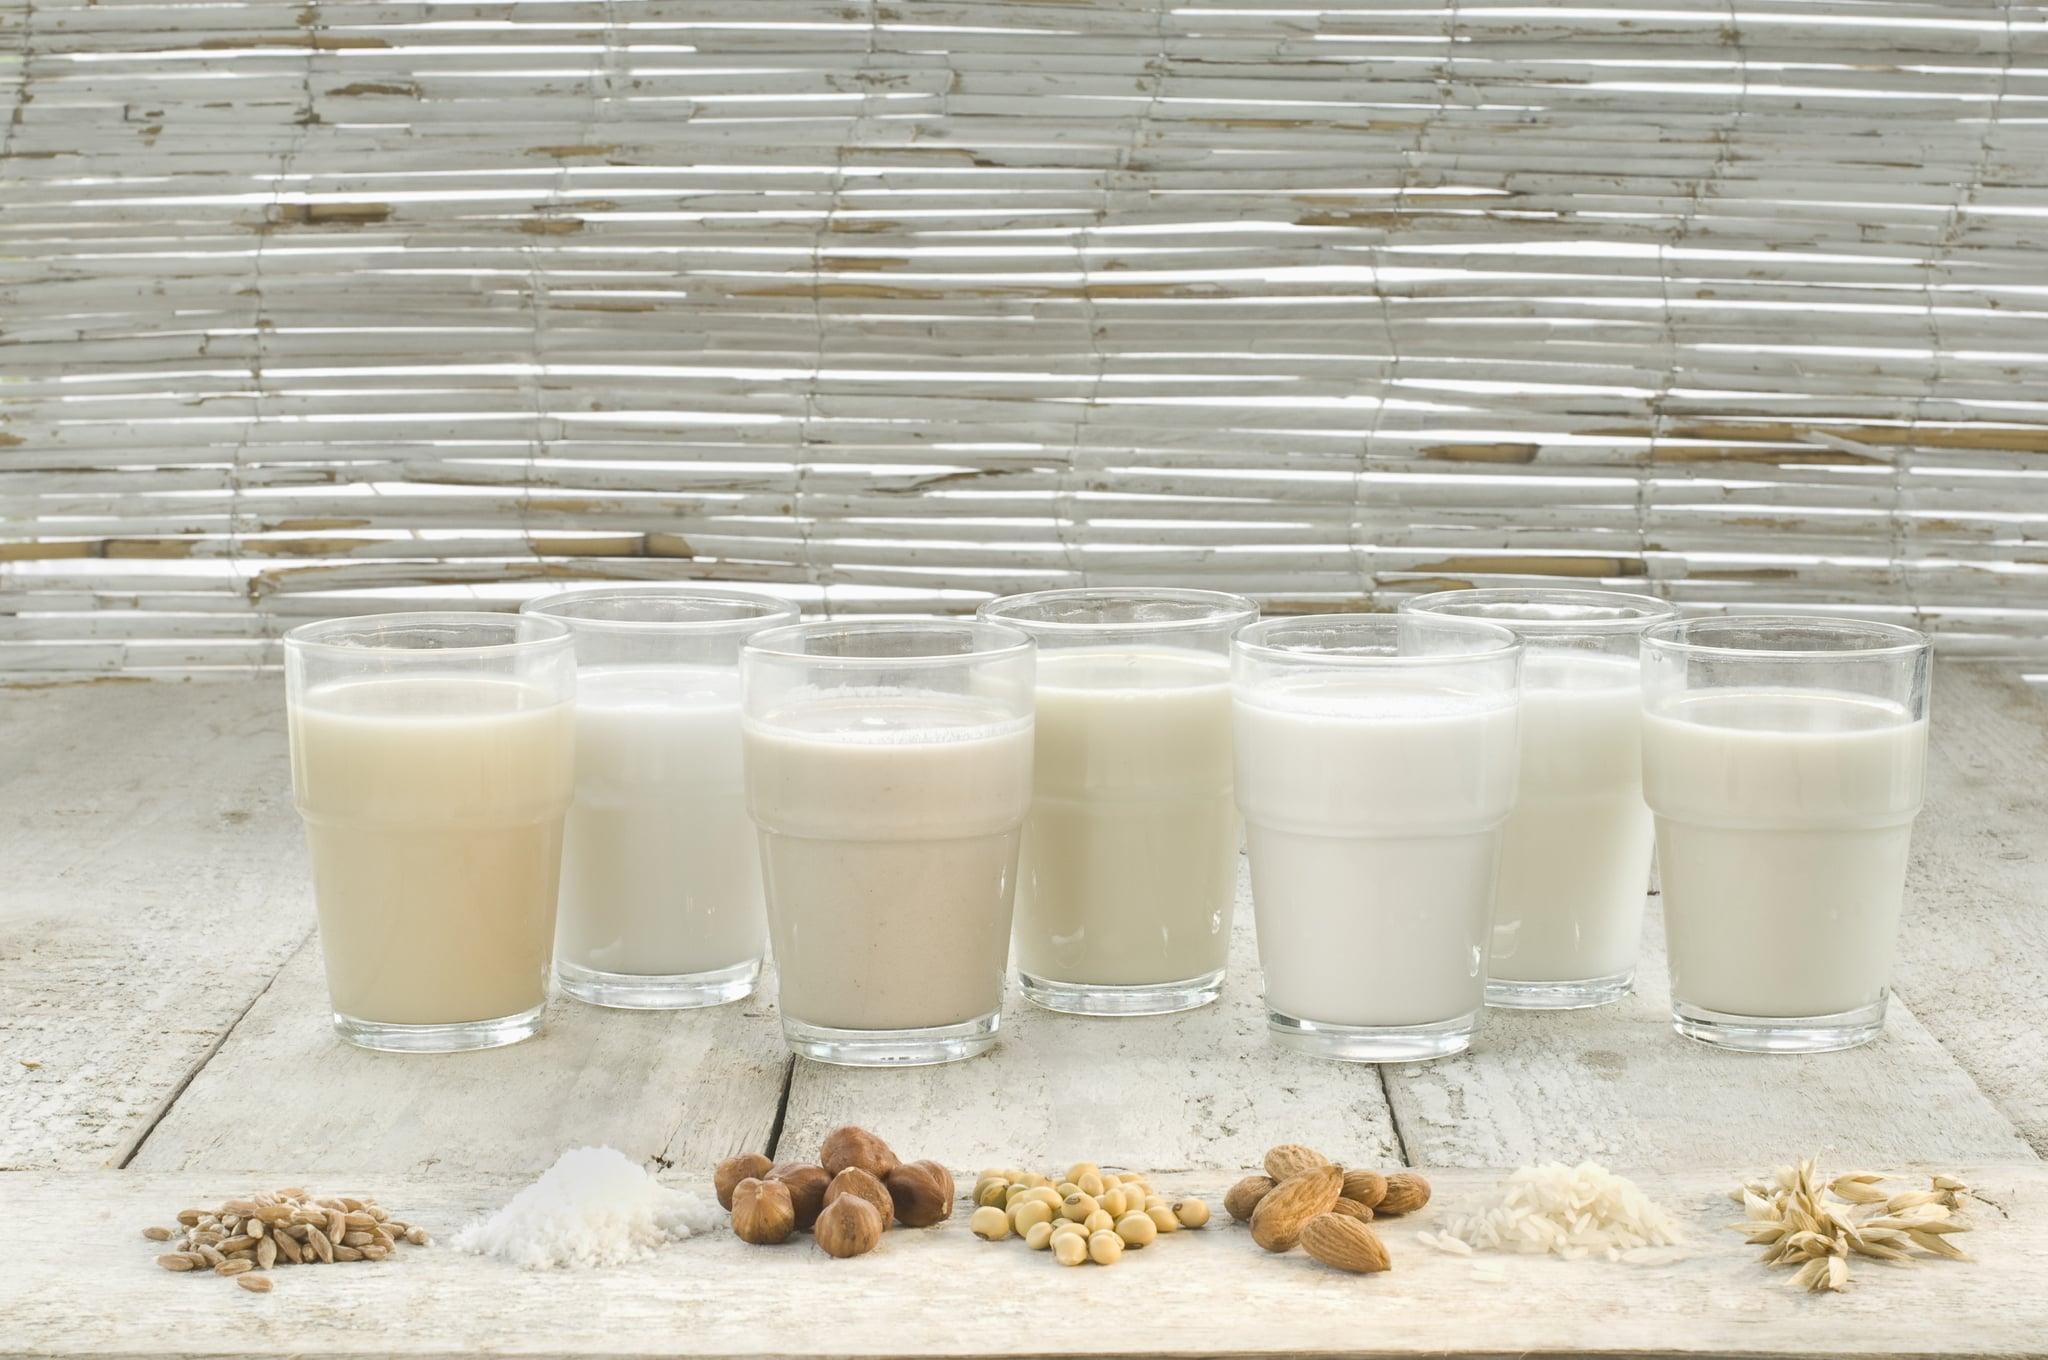 Various types of lactose-free milks in glasses